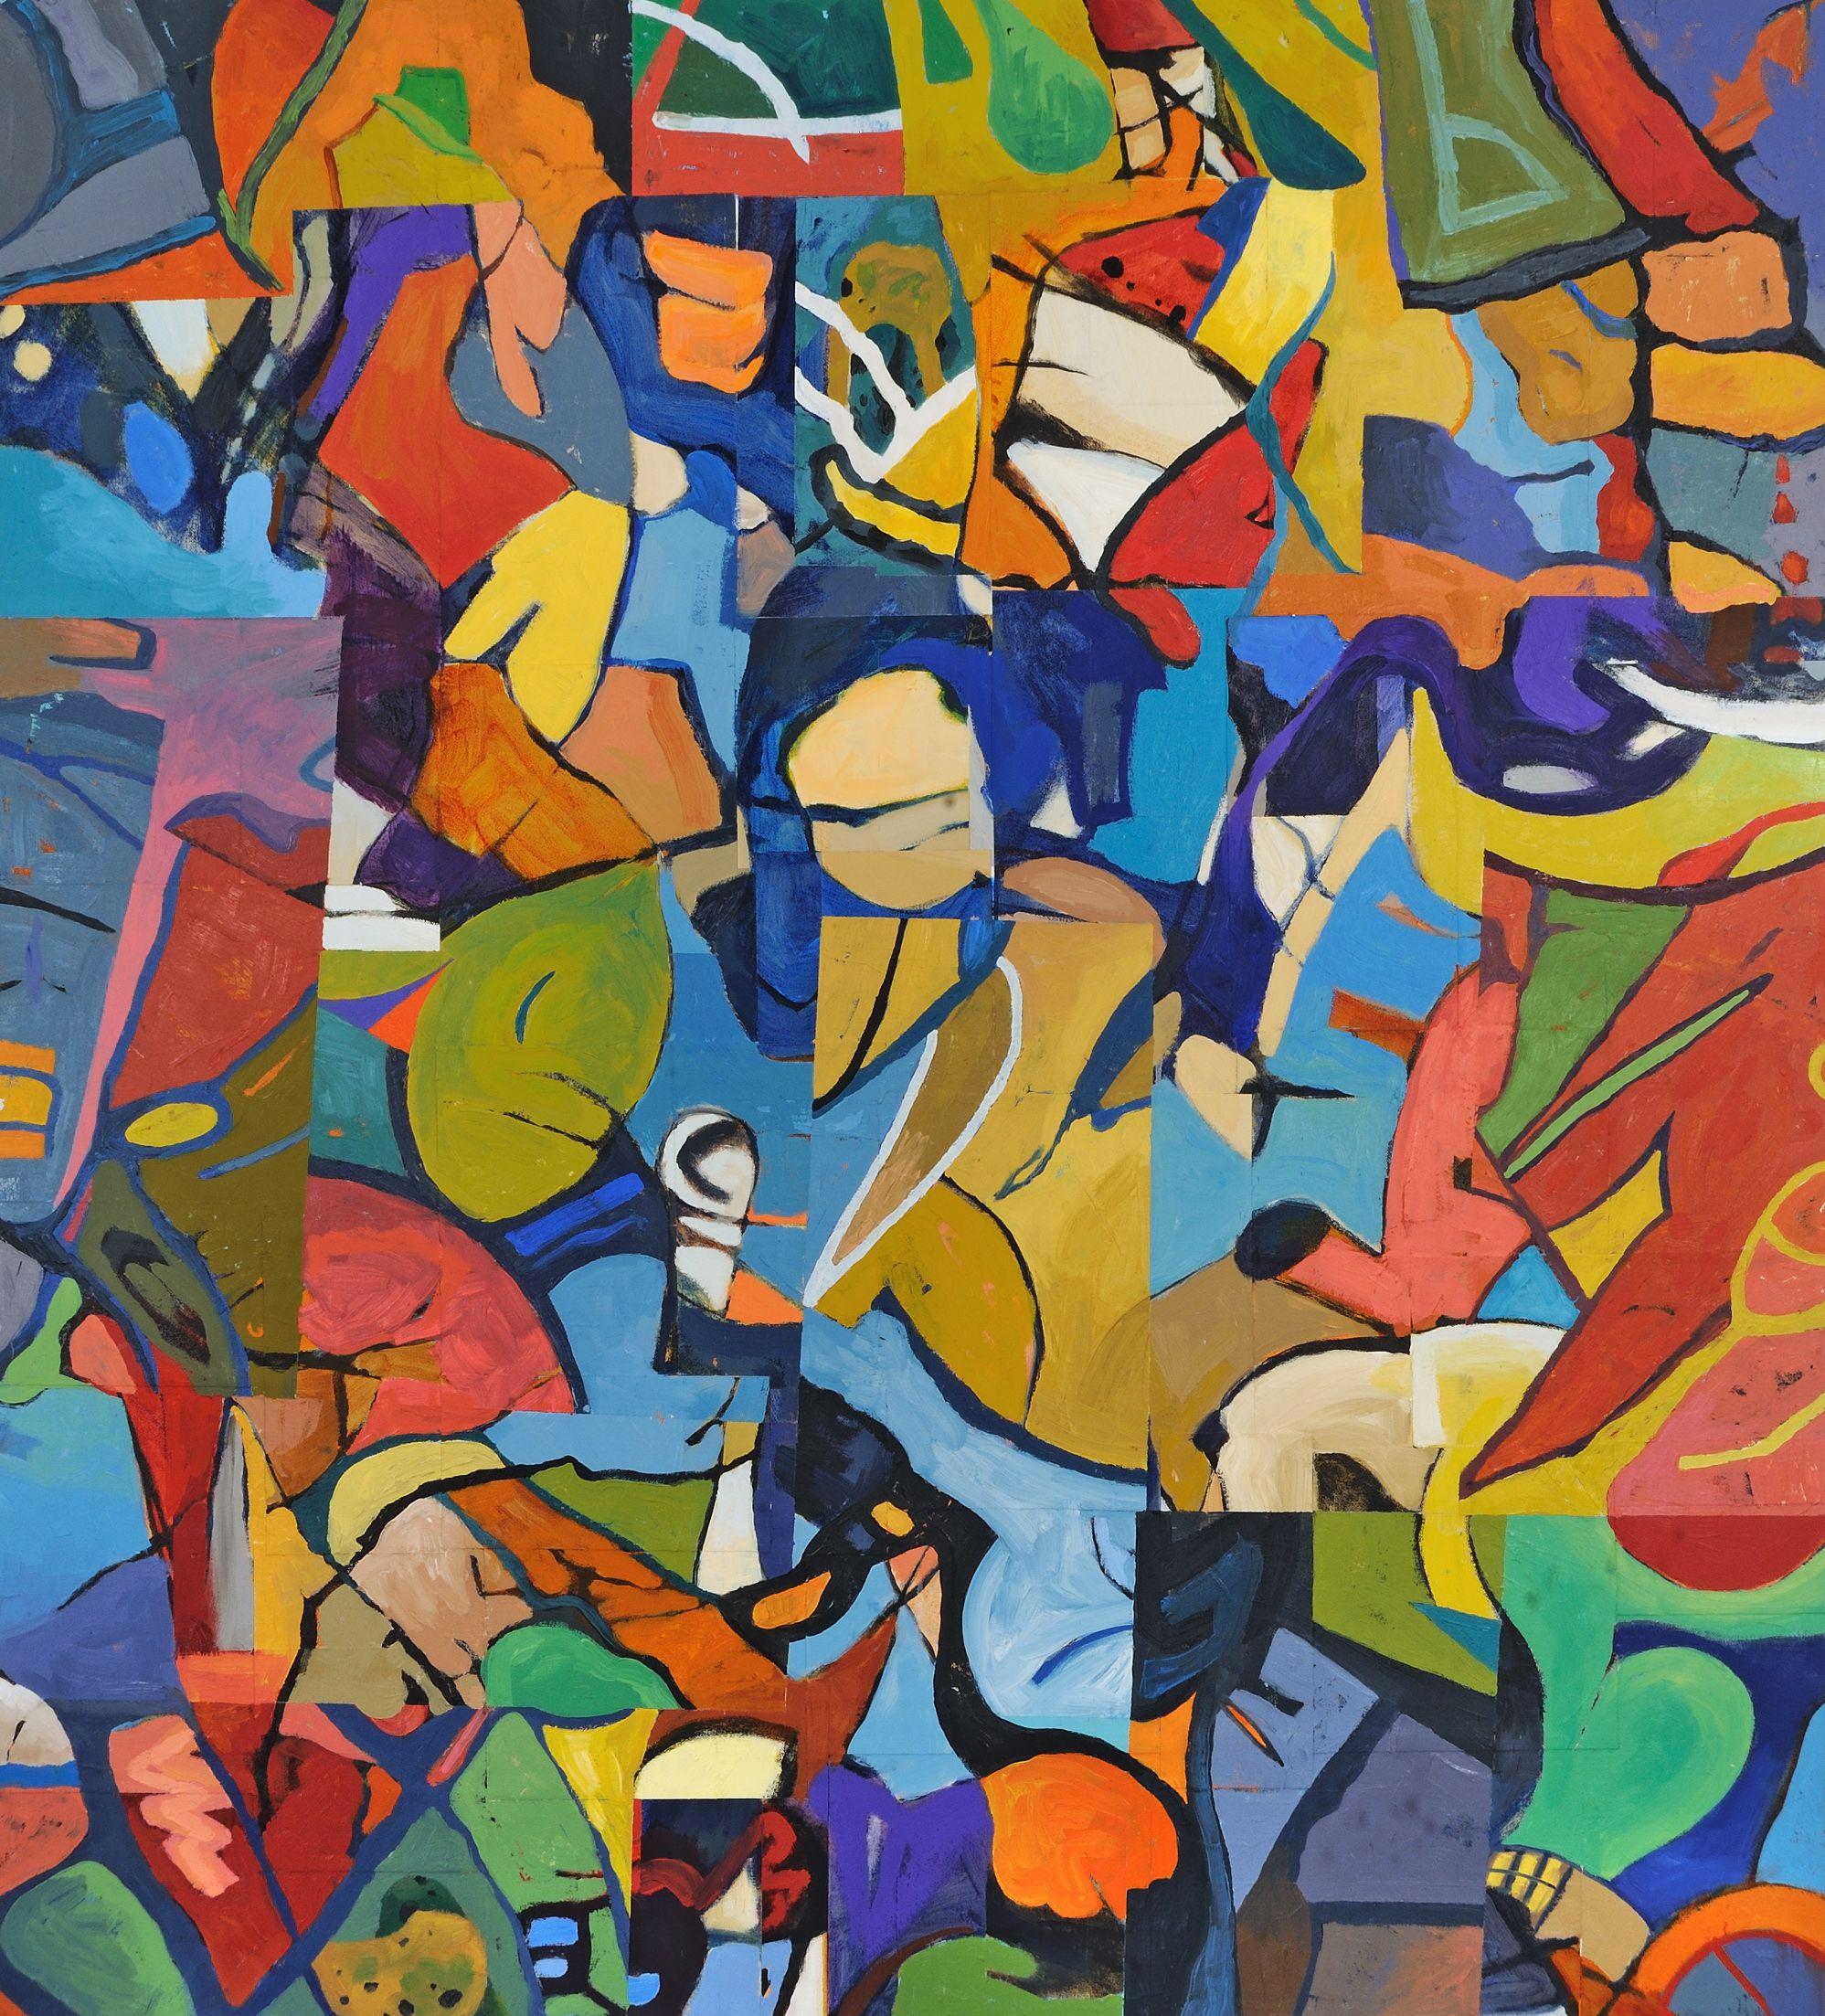 "Conglomeration   Deborah Addison Coburn  Oil on Canvas  36"" x 40""  $1,800   Click to Inquire"